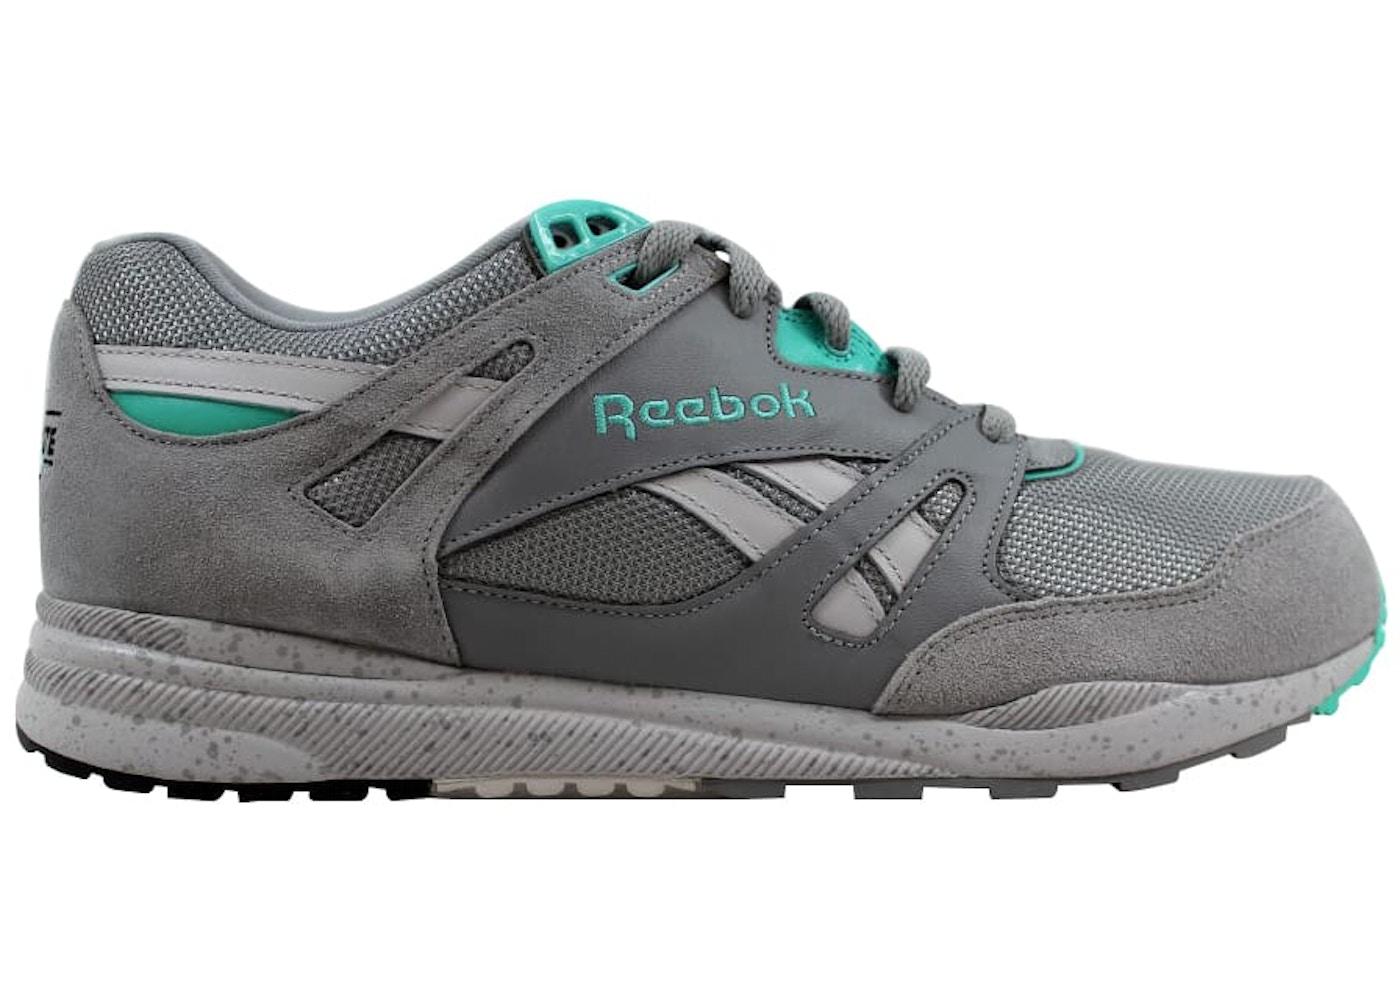 Reebok Size 13 Shoes - Featured e6434e073